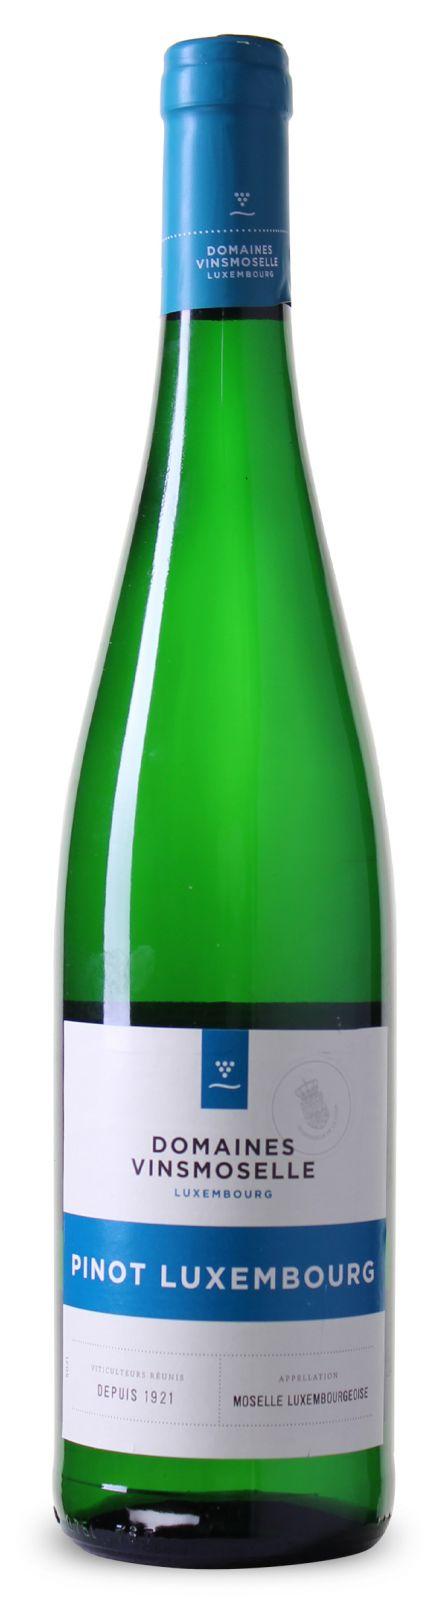 domaines-vinsmoselle-pinot-luxembourg-aoc_bottle-500x500.jpg